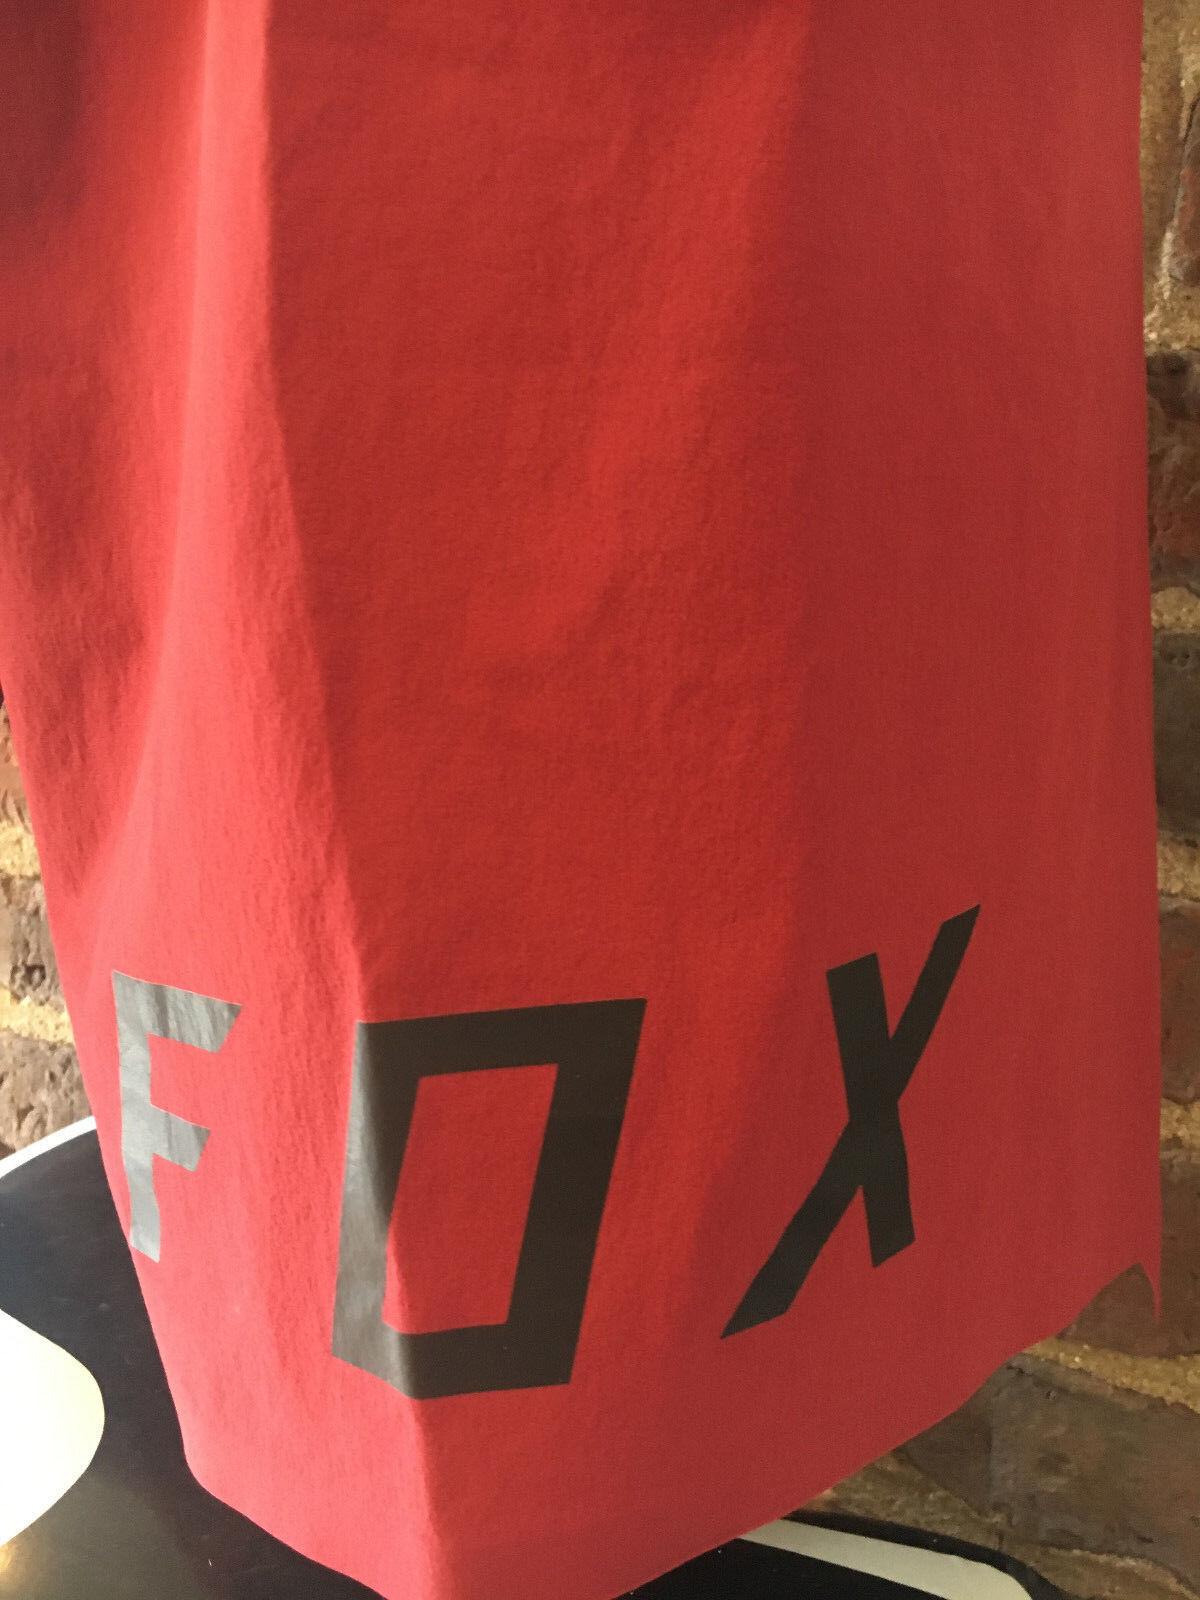 Fox Attack Performance Performance Performance Shorts Mtb Incl. innenhose Pad amovible Dark Red NEUF e10f16